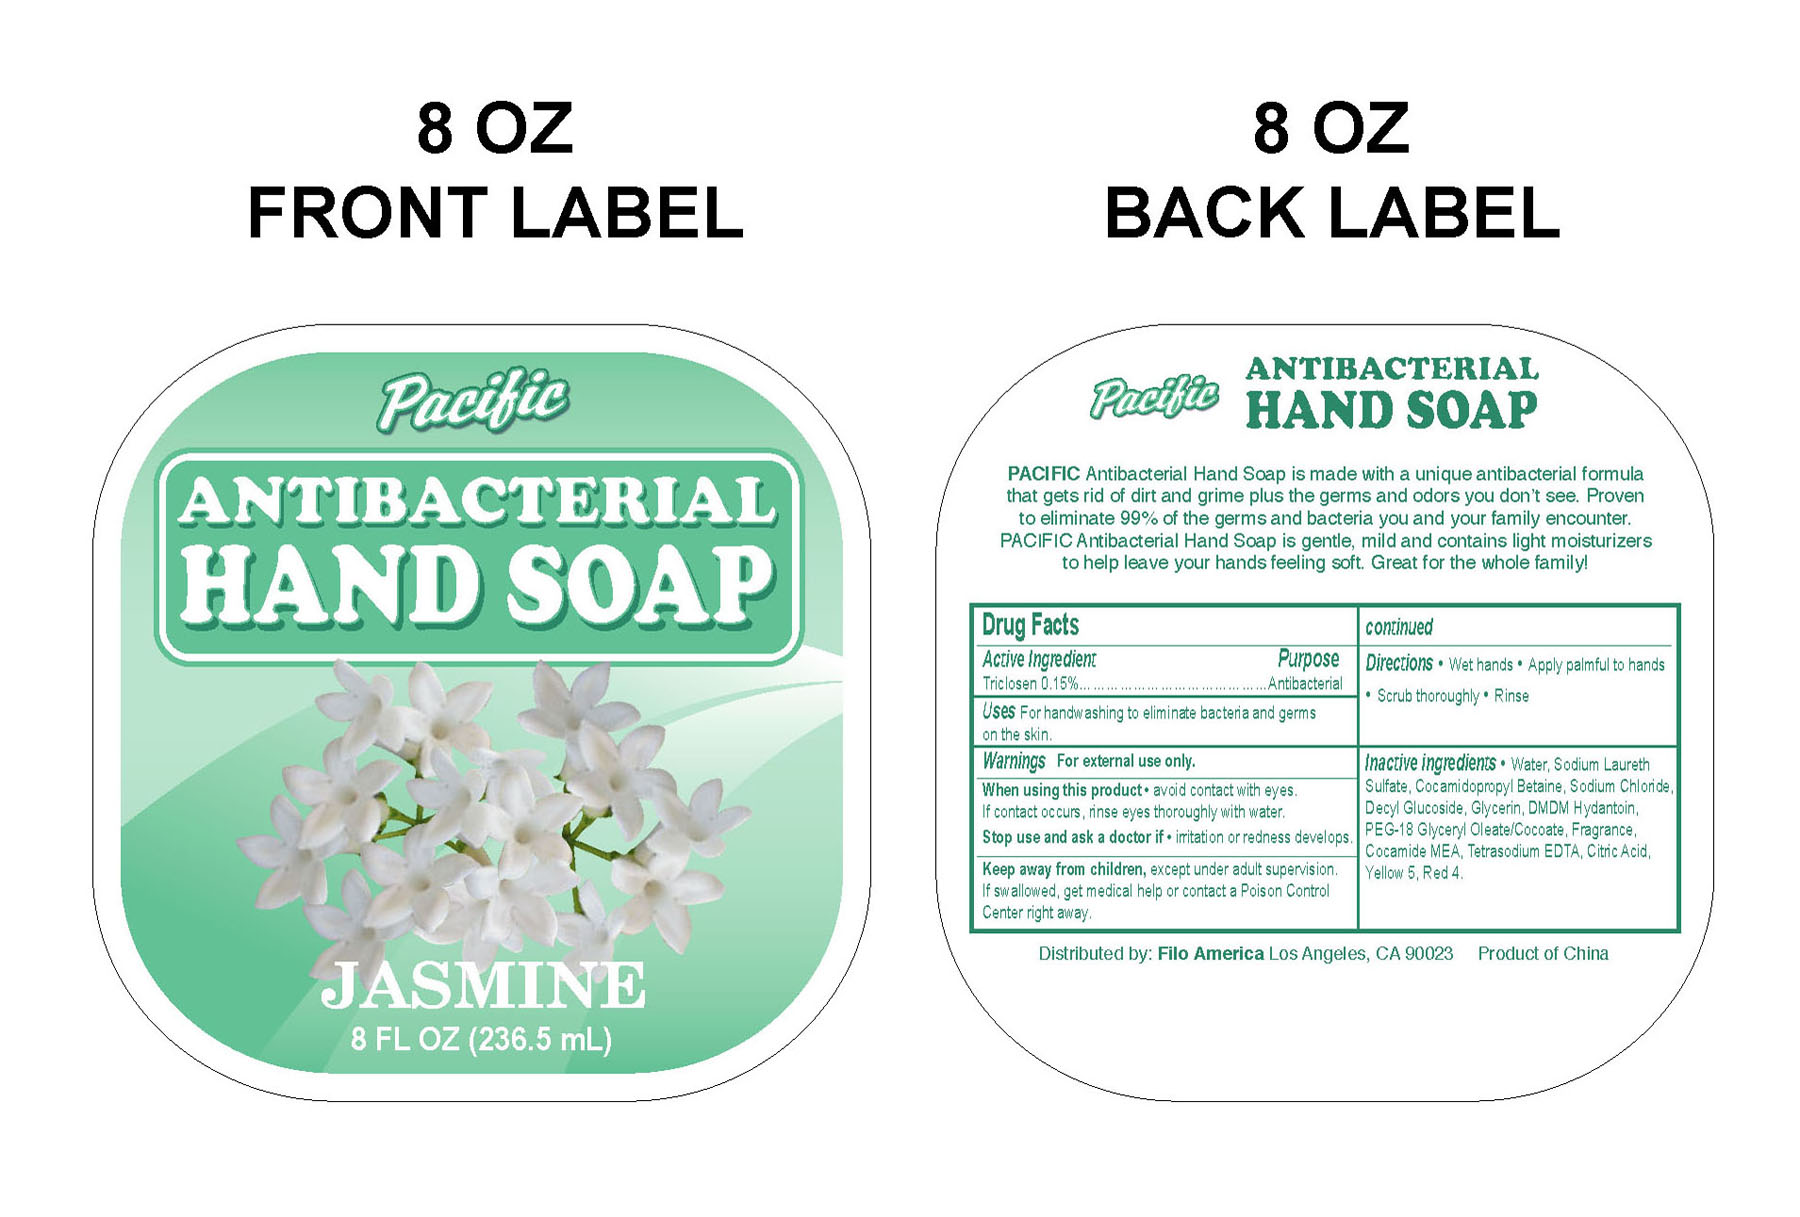 Label for 8 oz